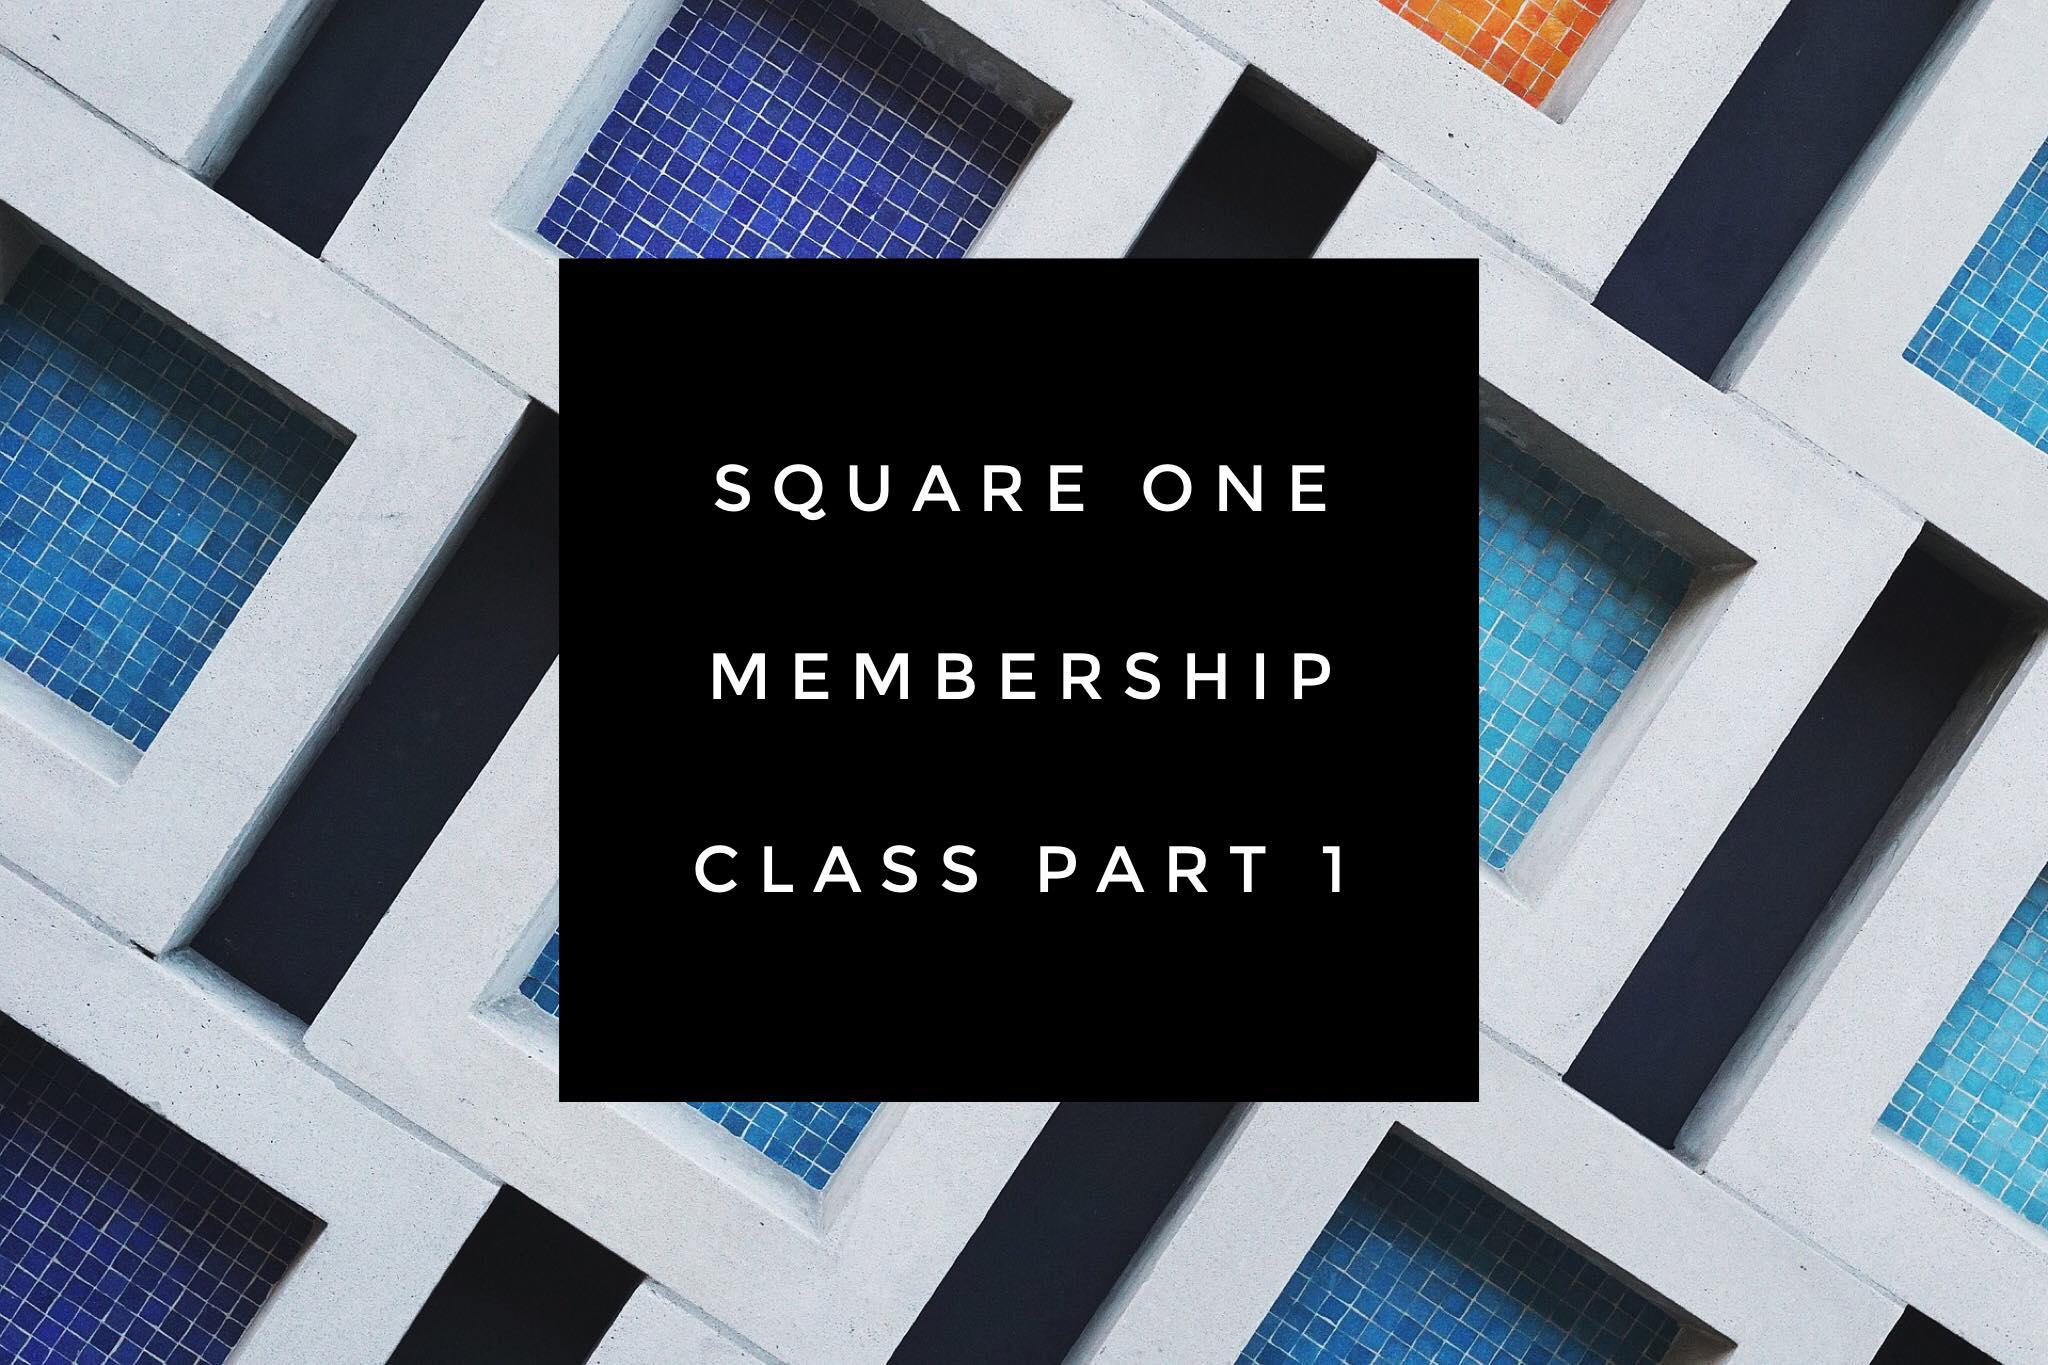 Square one pt 1